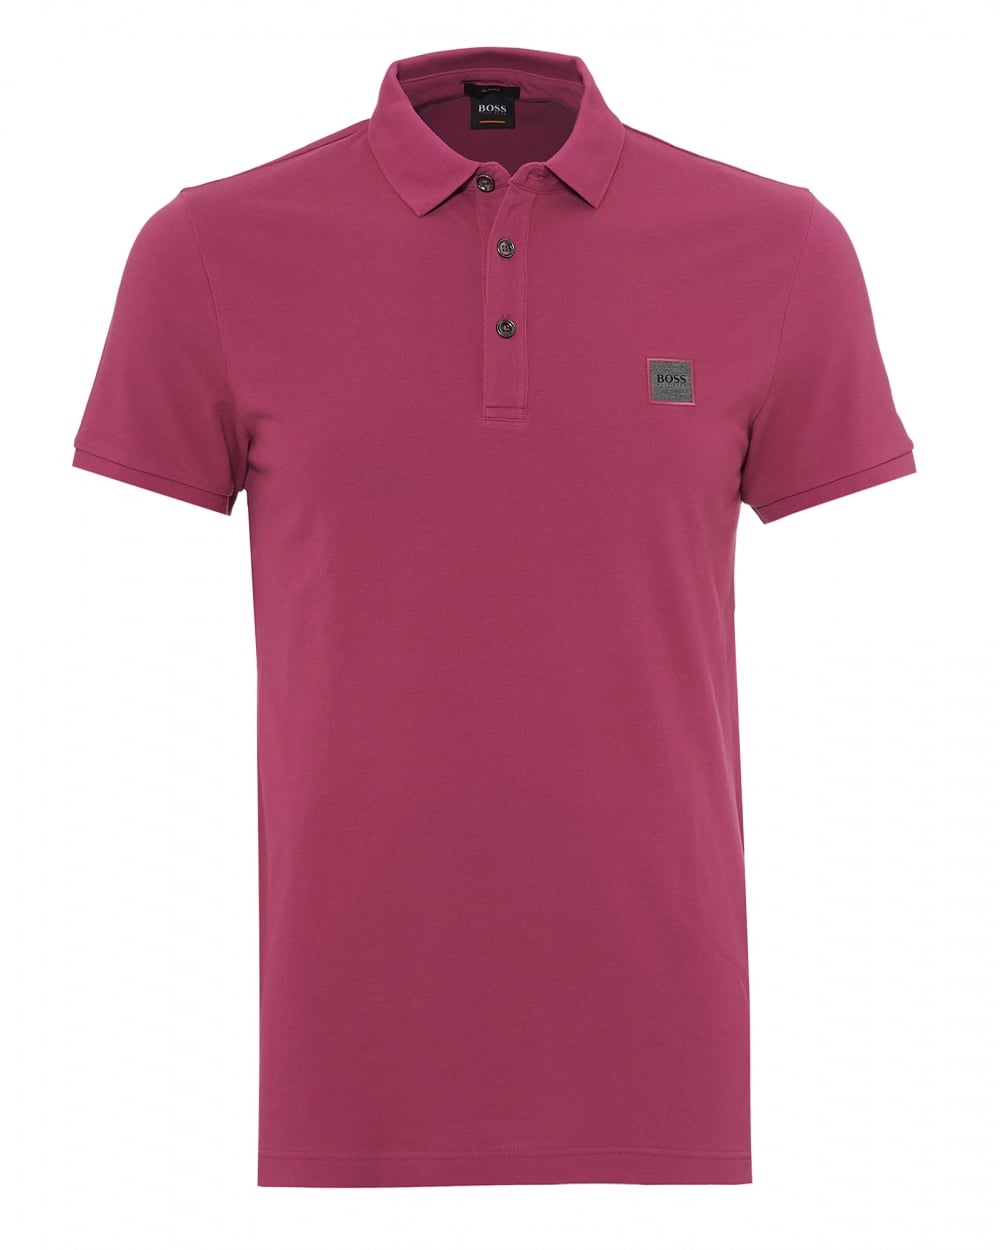 Mens Passenger Polo Shirt, Slim Fit Deep Pink Polo